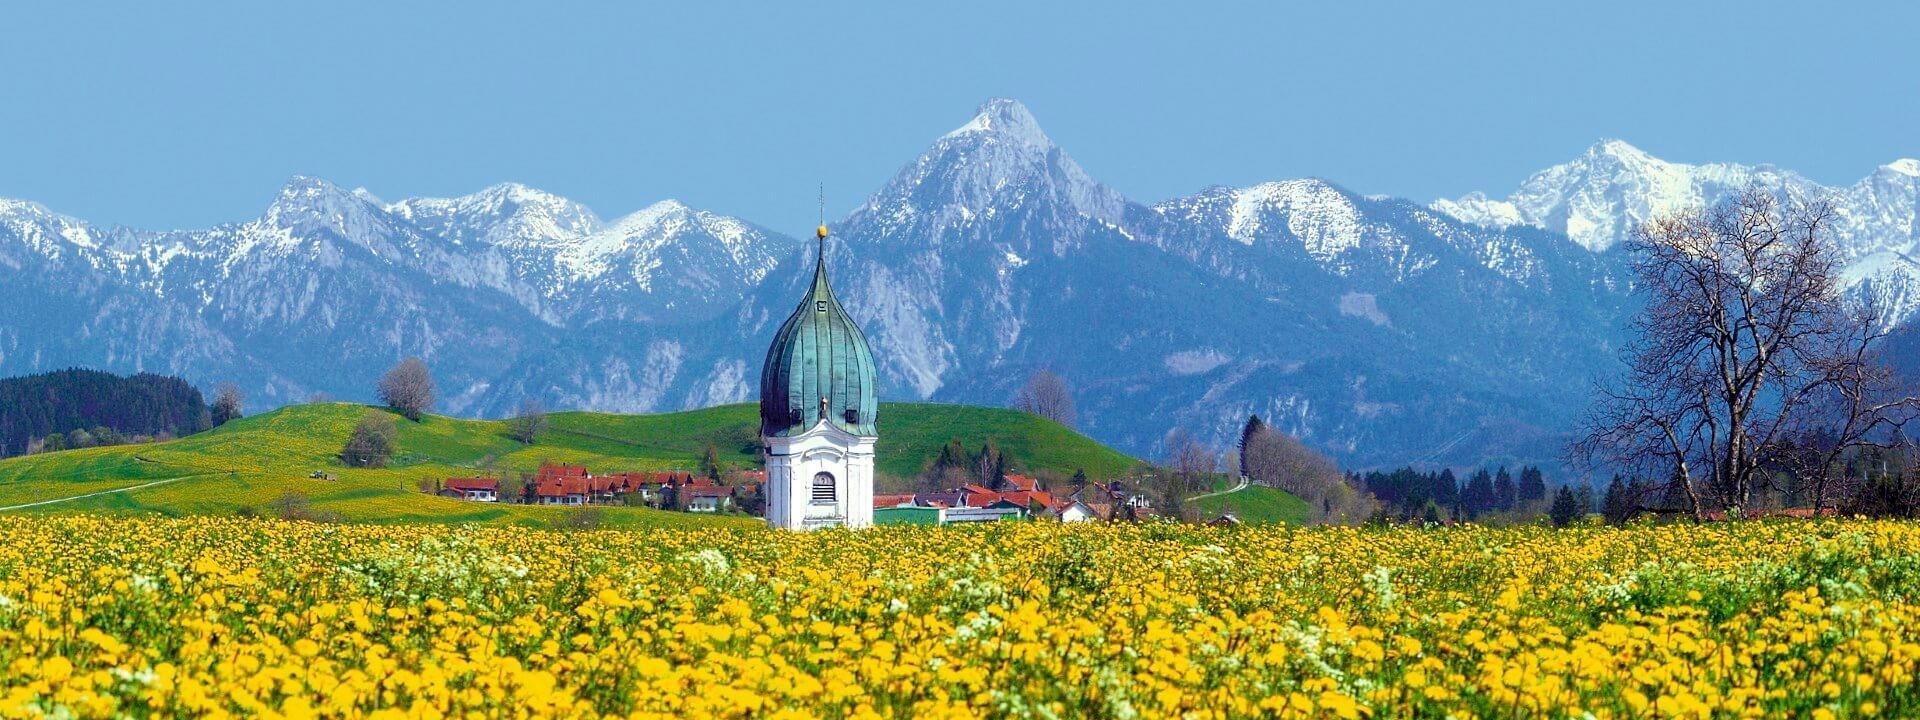 Frühling im Allgäu - Landhaus Ohnesorg